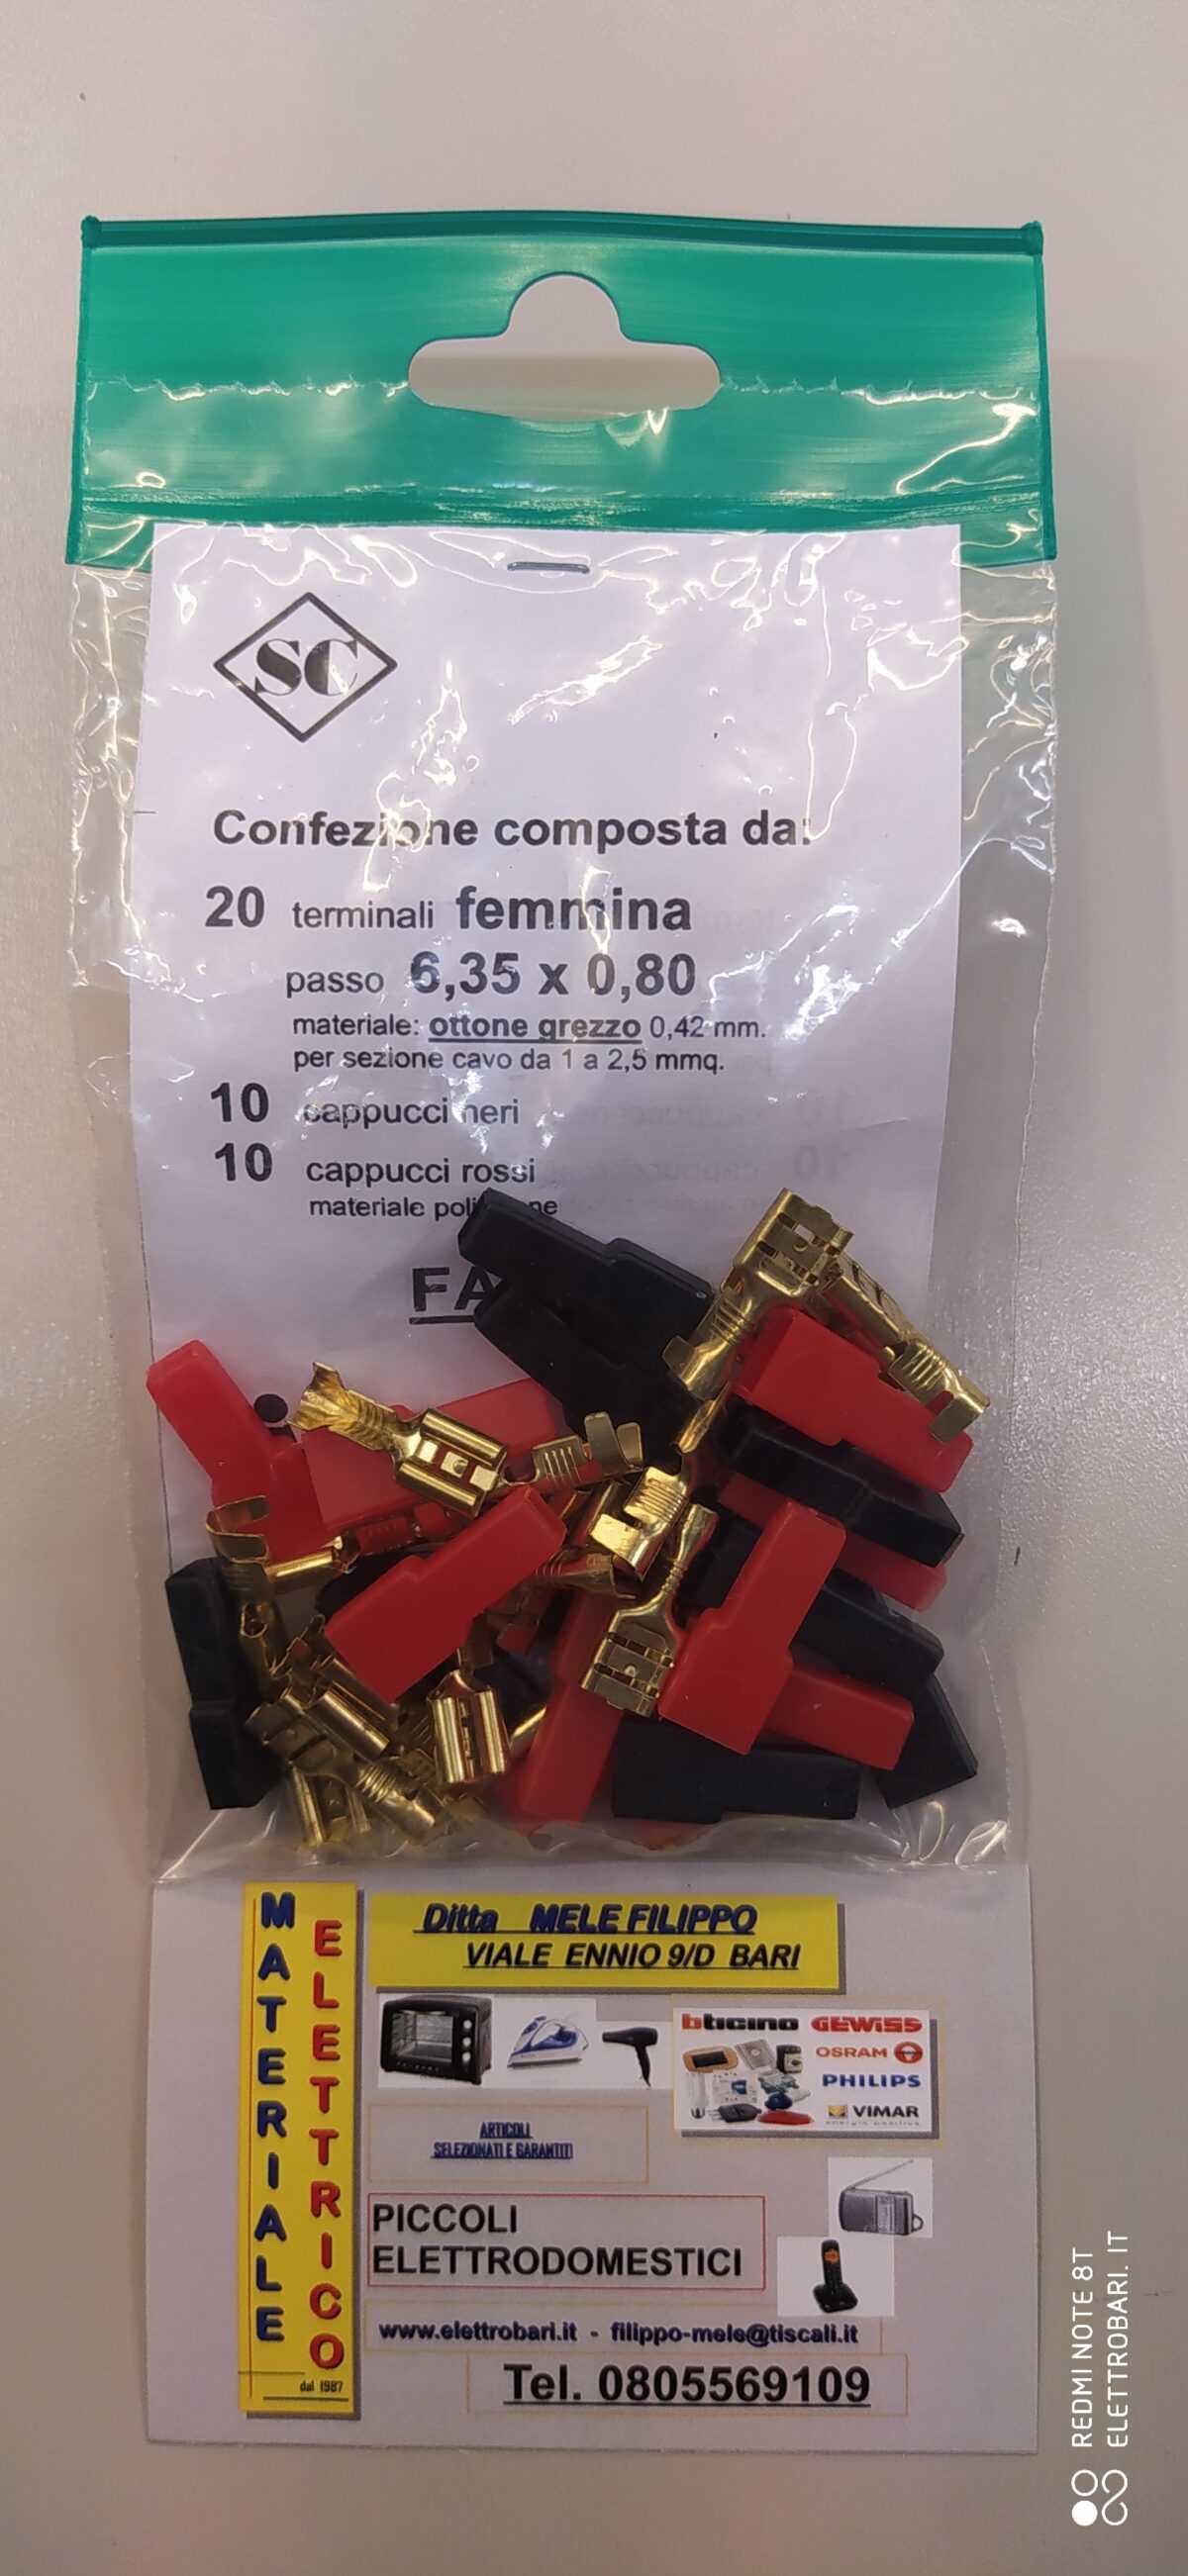 terminali per spinotto 6.35mm femmina